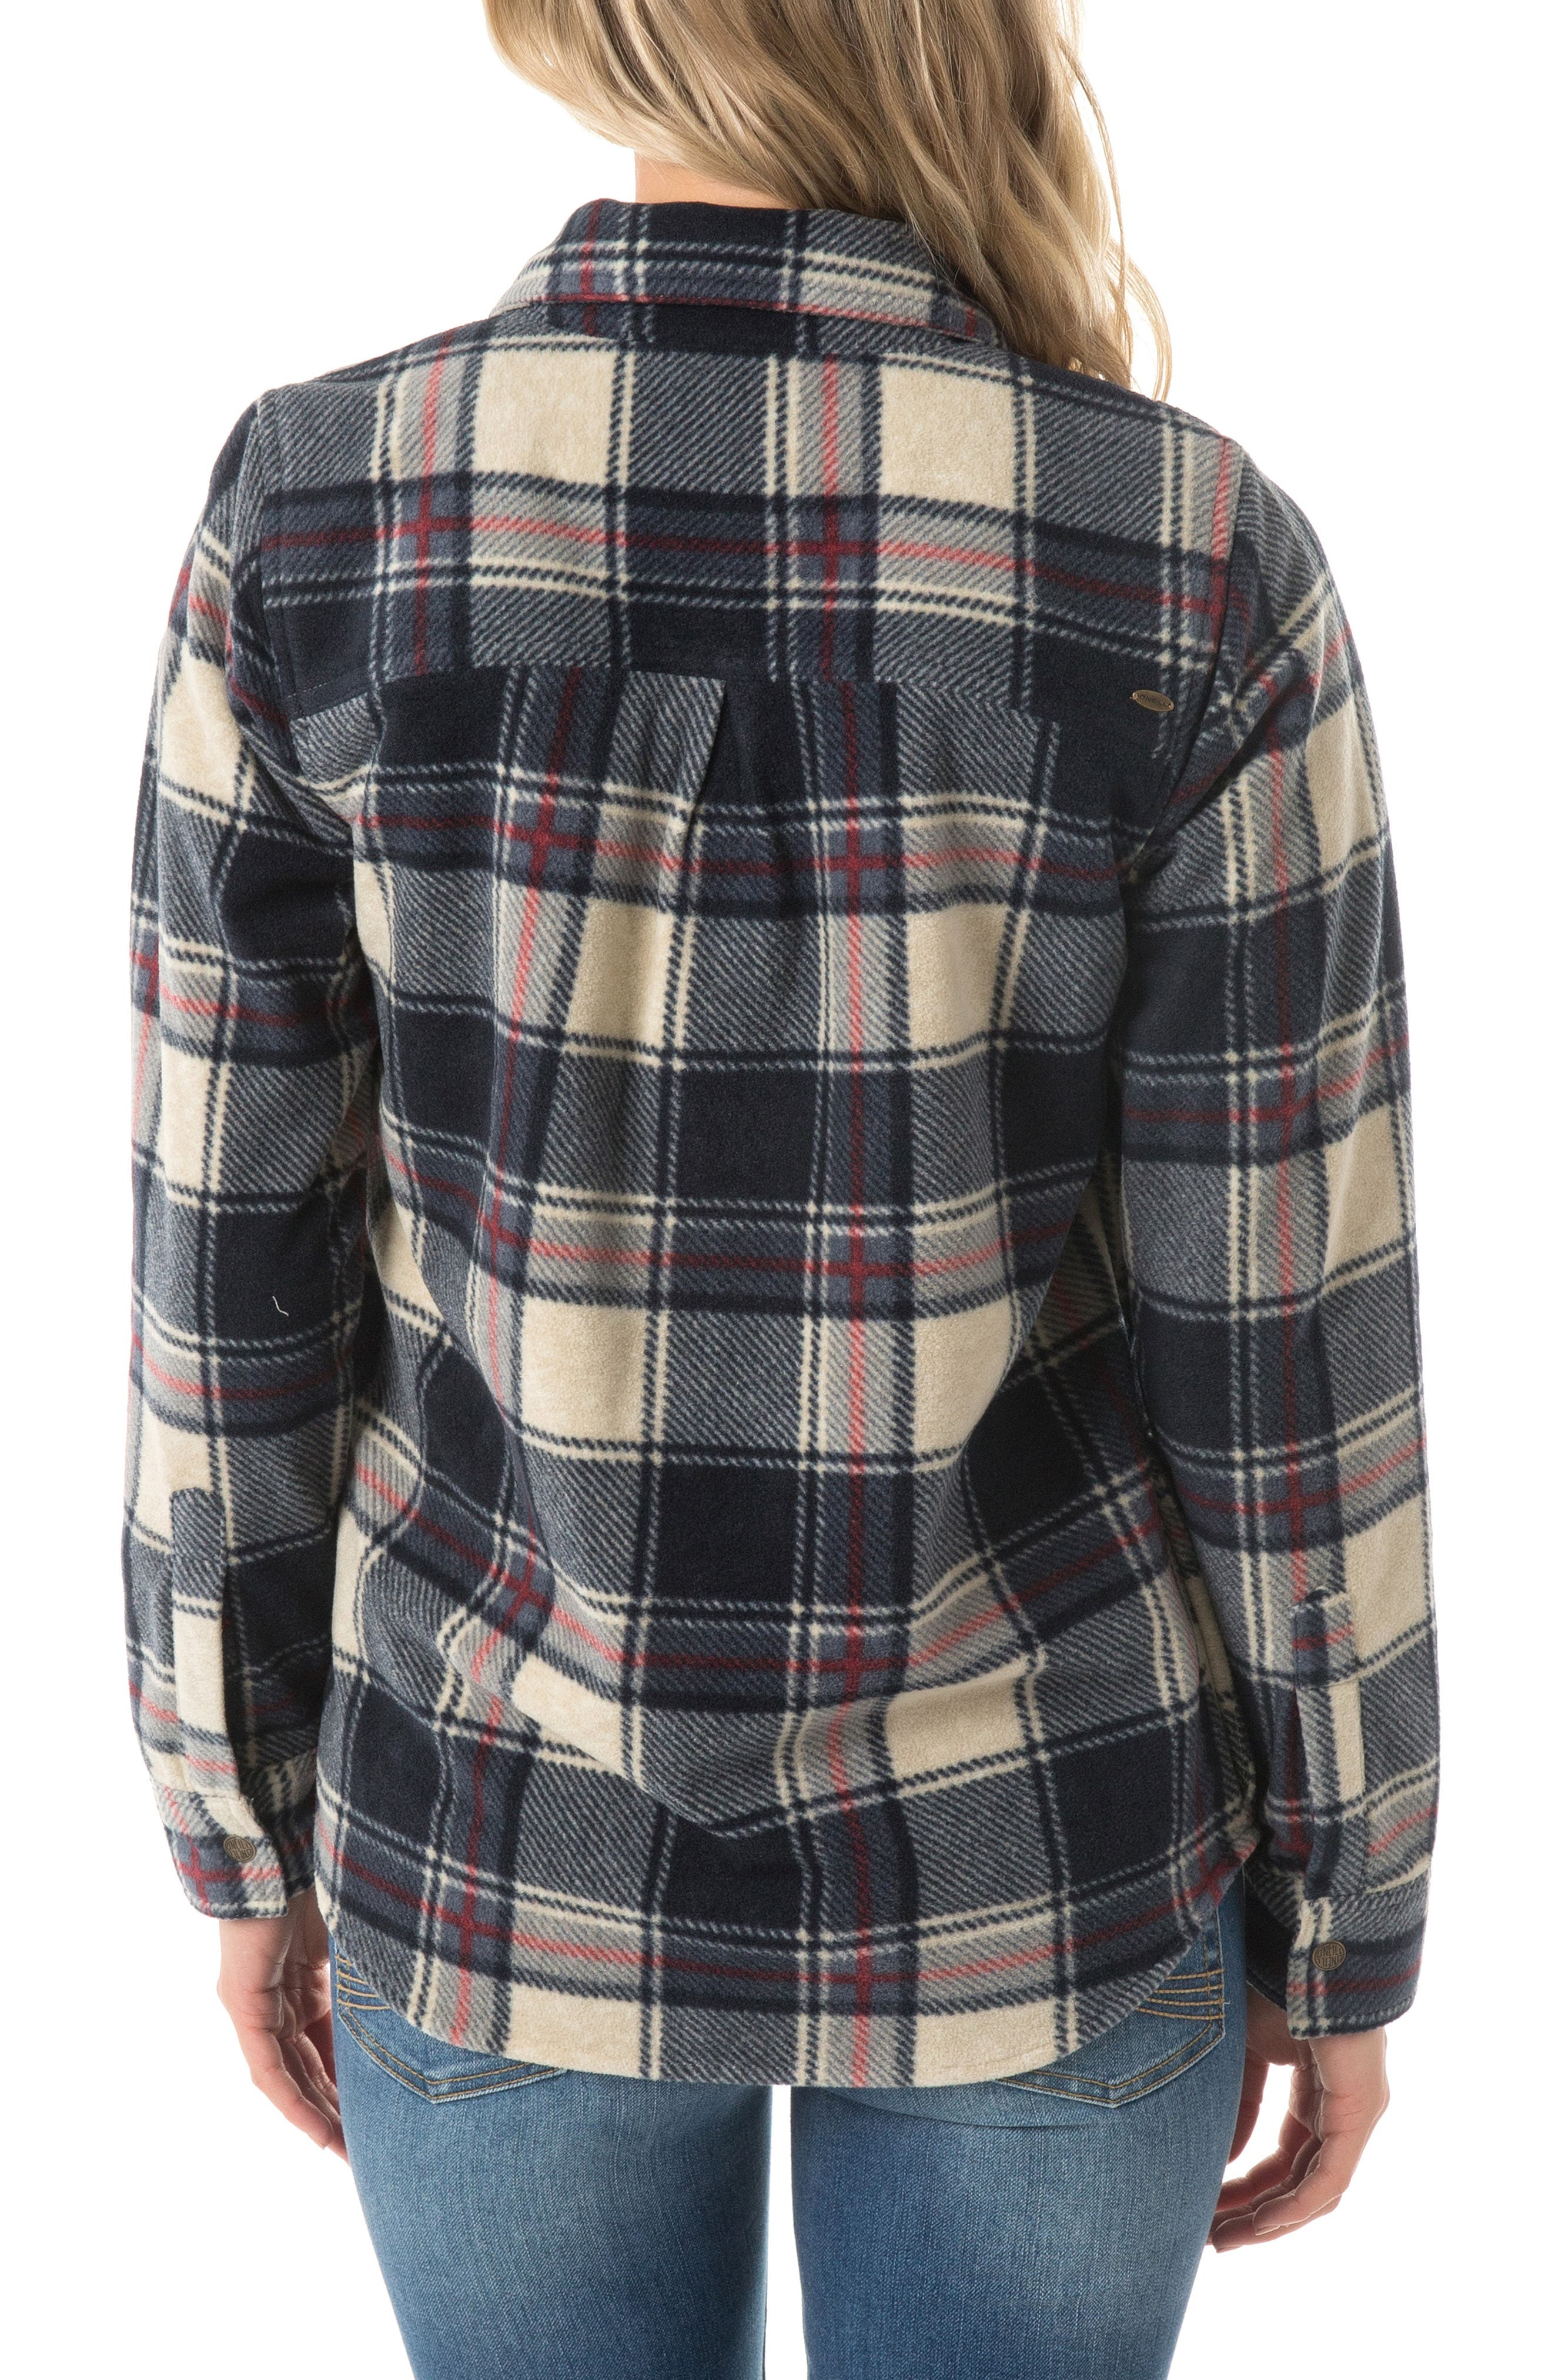 O'NEILL, Zuma Plaid Fleece Flannel Shirt, Alternate thumbnail 2, color, 021